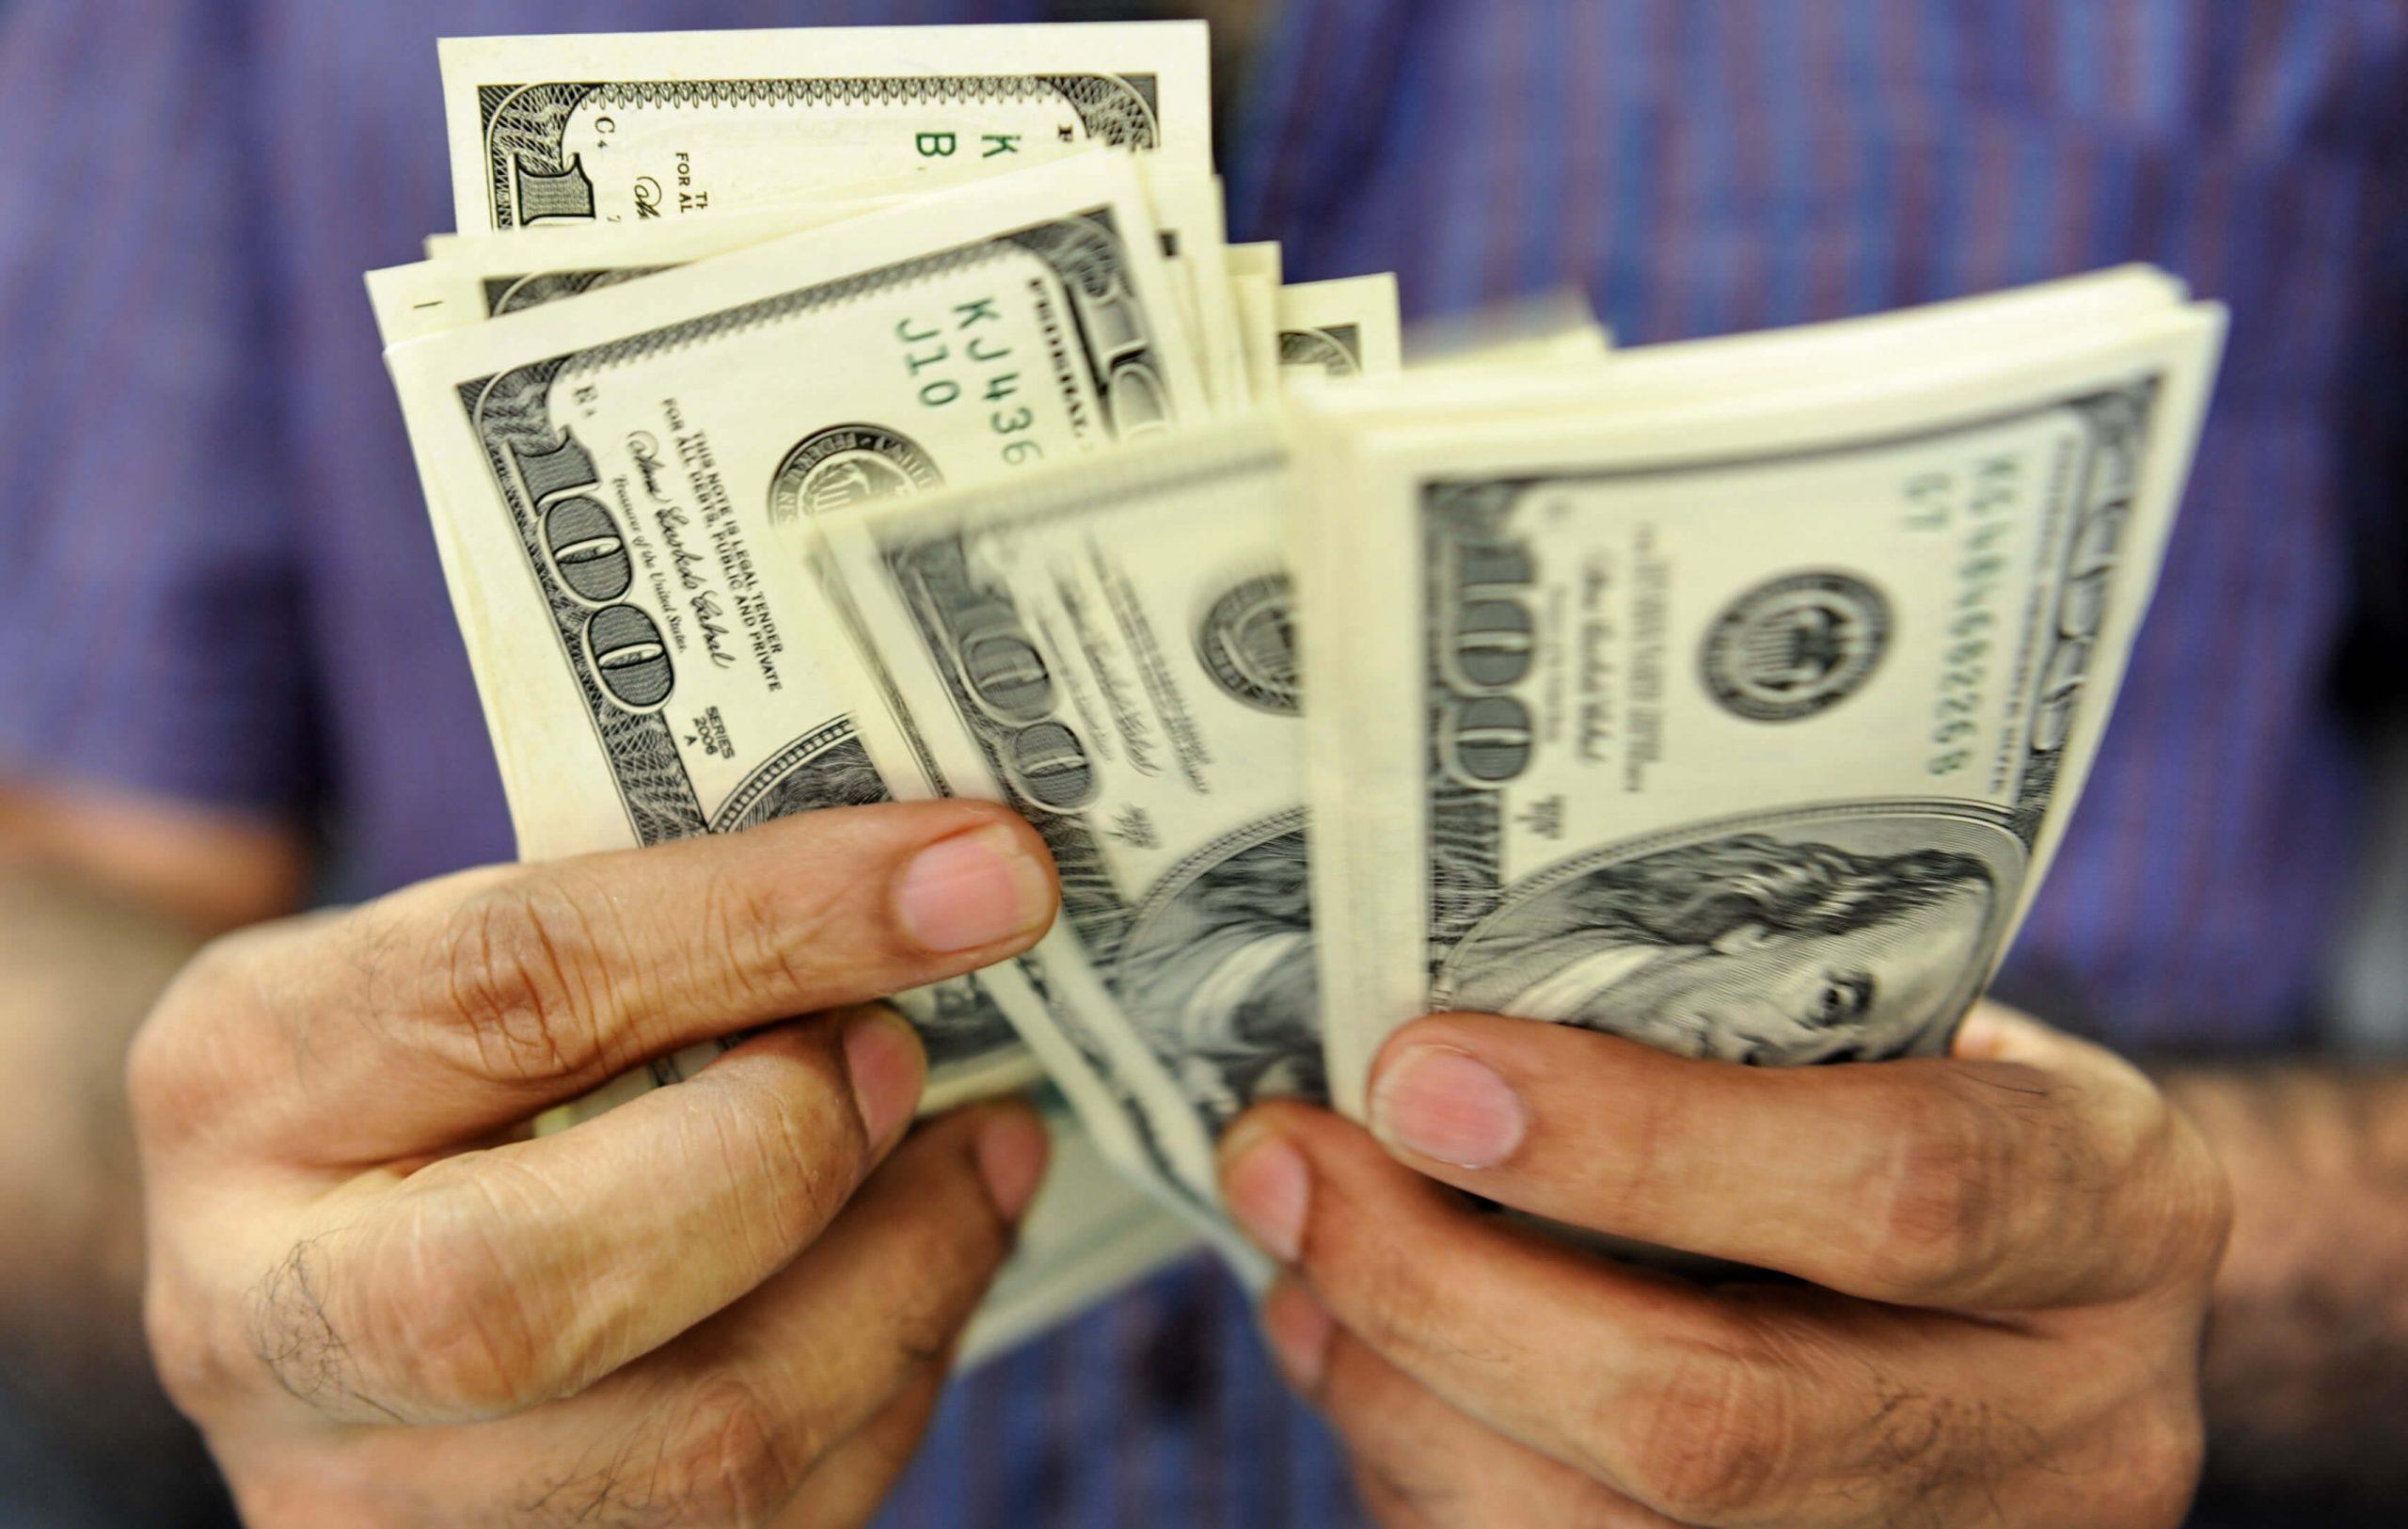 Value for money_Subscription model